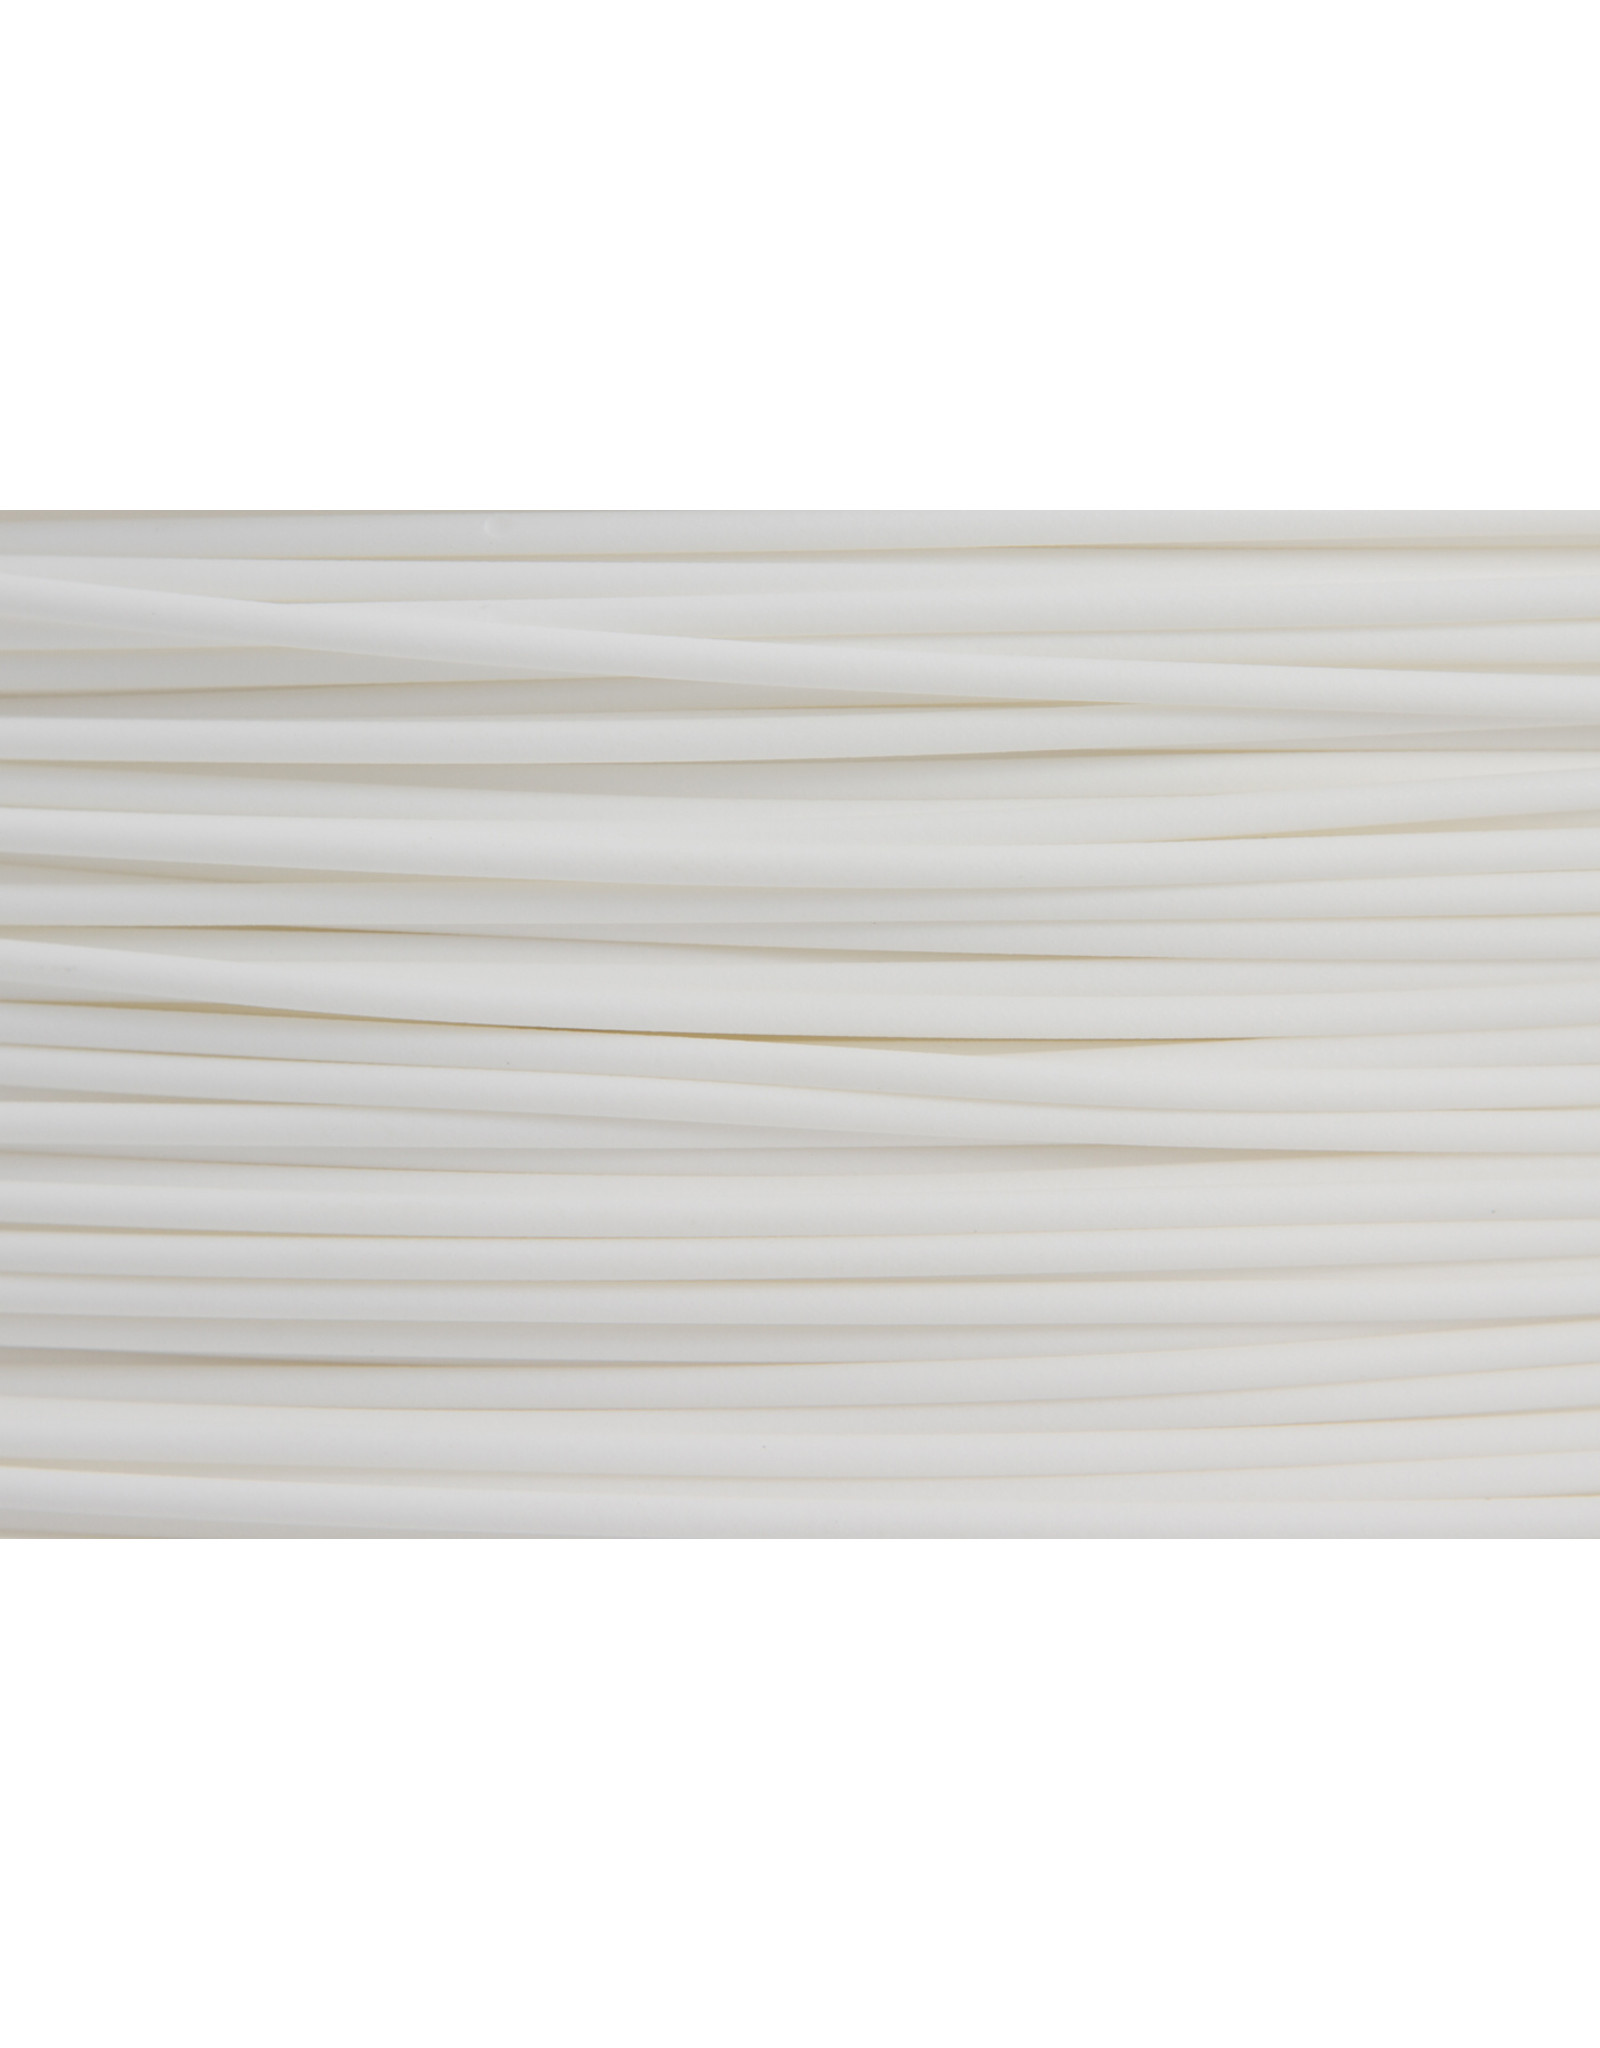 Prima PrimaSelect ABS 1.75mm  750gr White